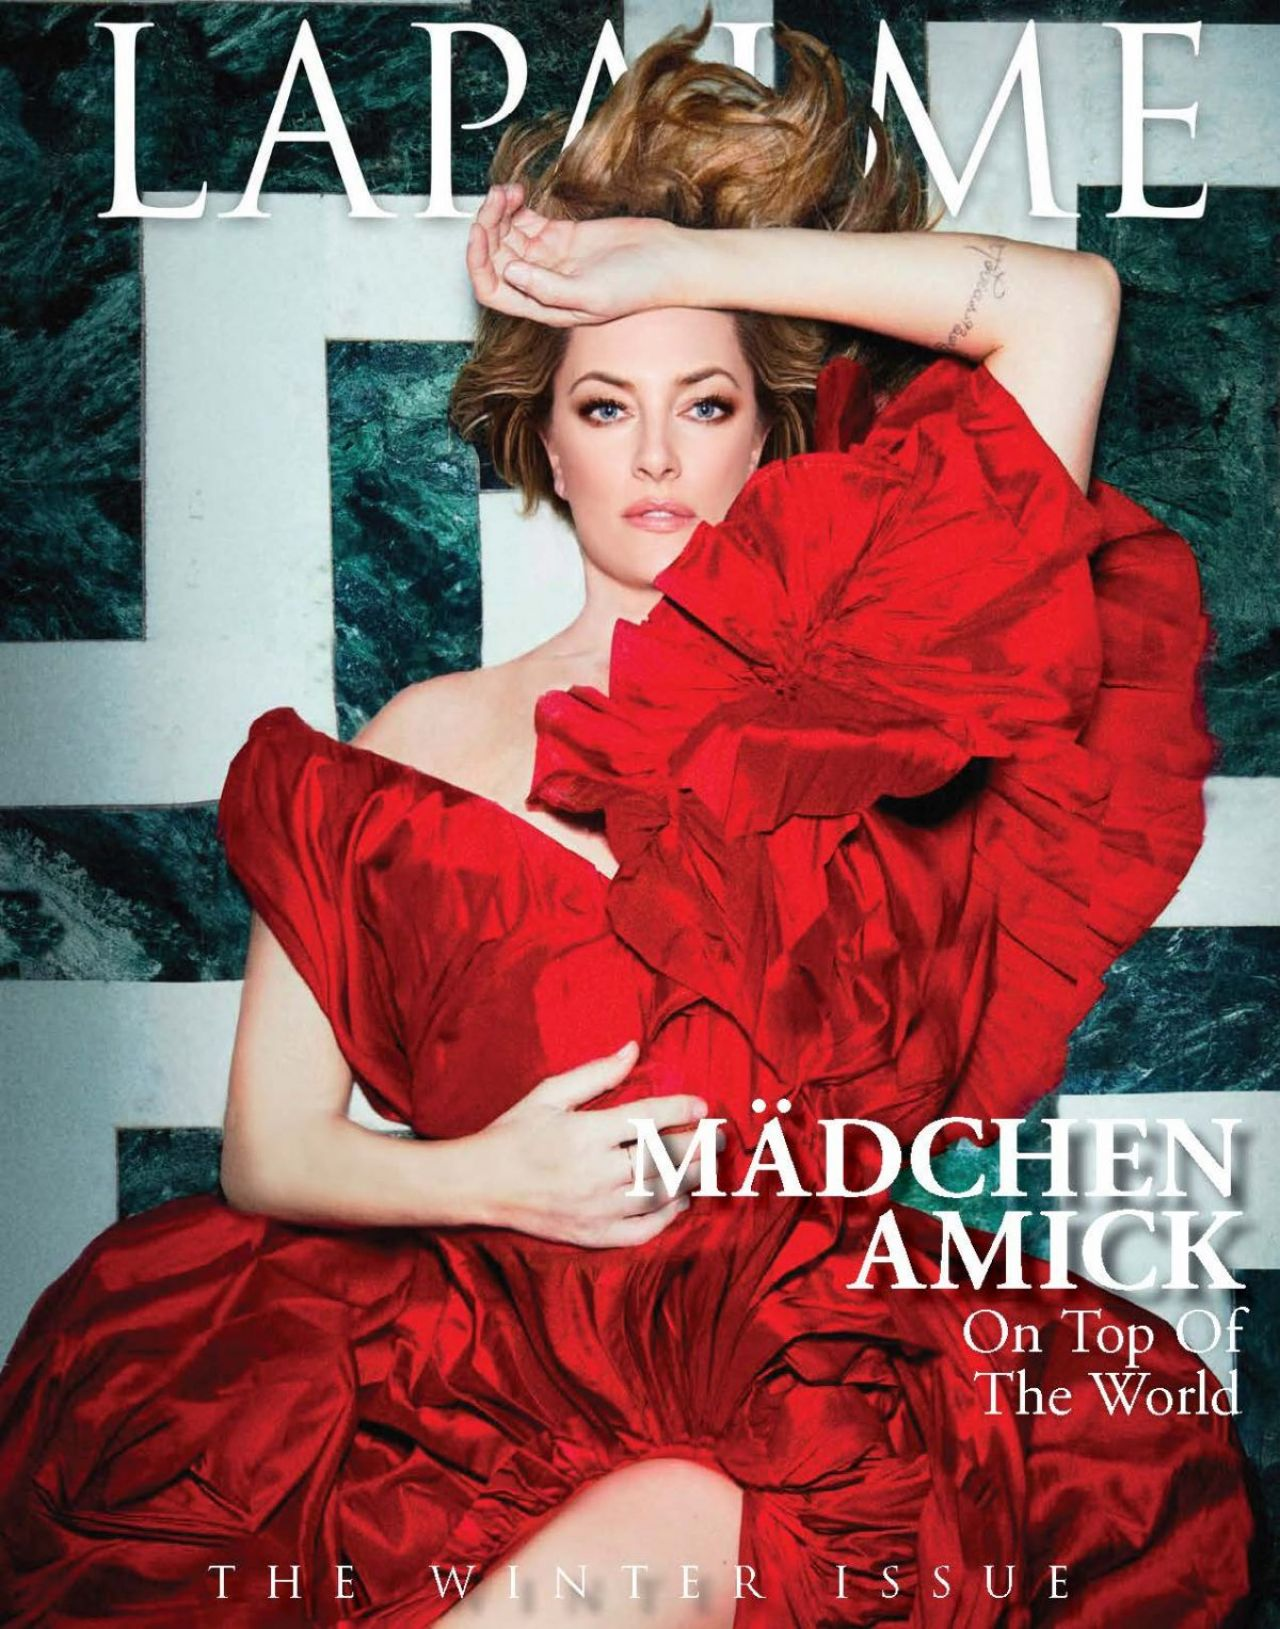 Madchen amick lapalme magazine winter 2018 for Kinderzimmermobel madchen